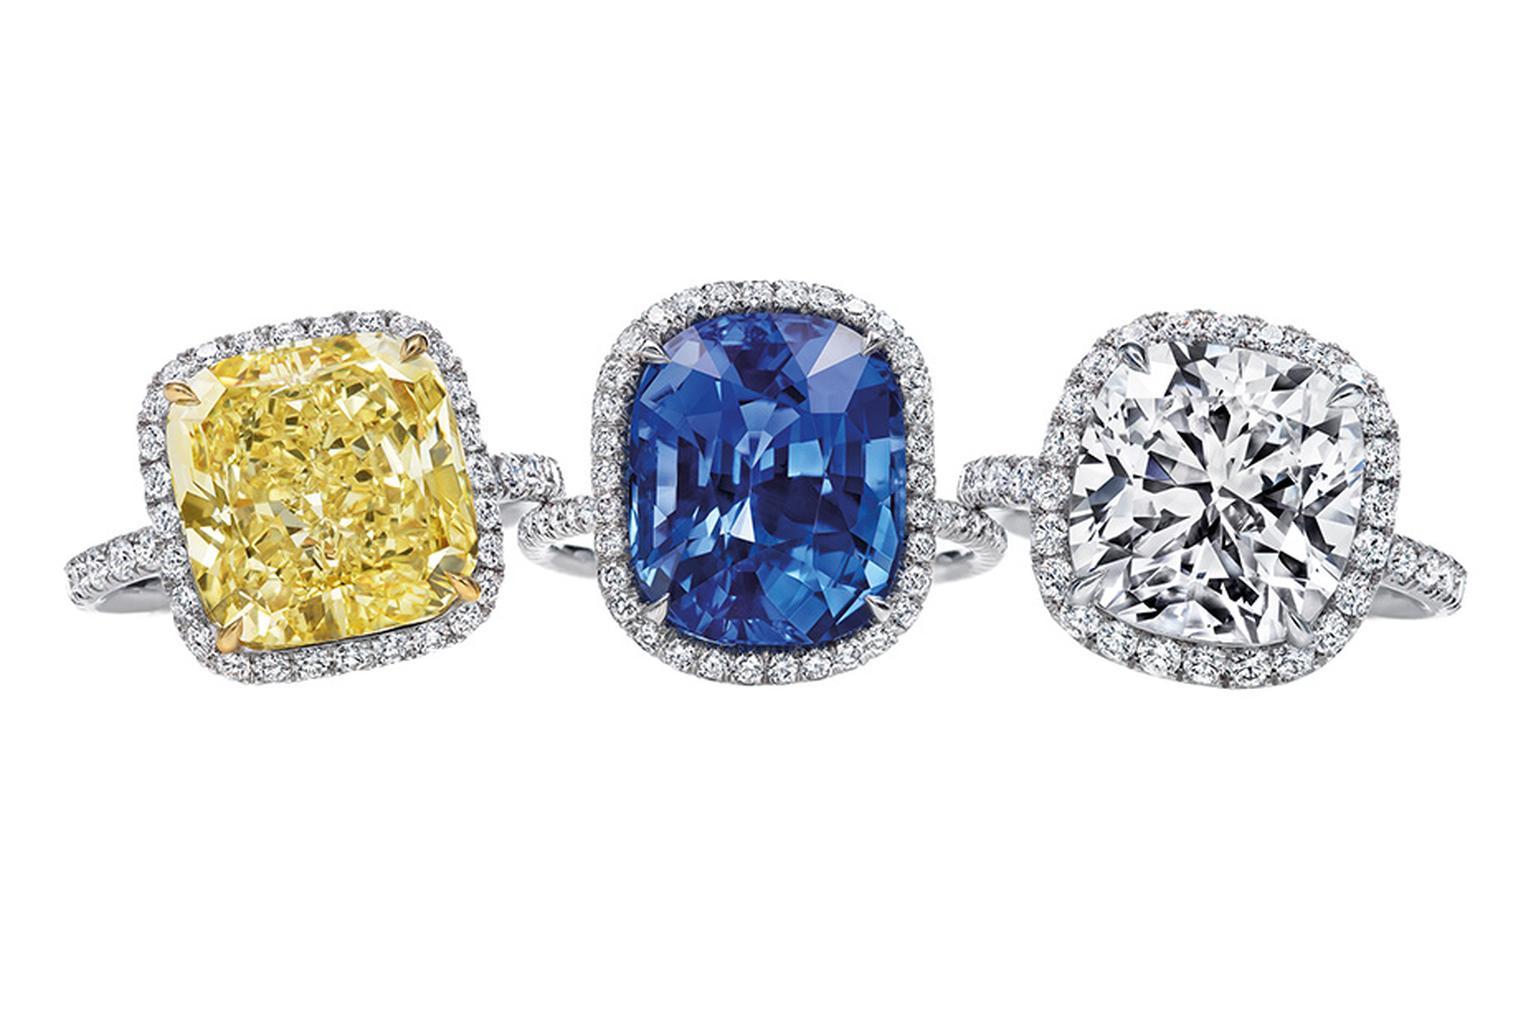 Harry Winston Cushion Cut Yellow Diamond, Sapphire And Regarding Cushion Cut Yellow Diamond Micropavé Rings (View 2 of 25)